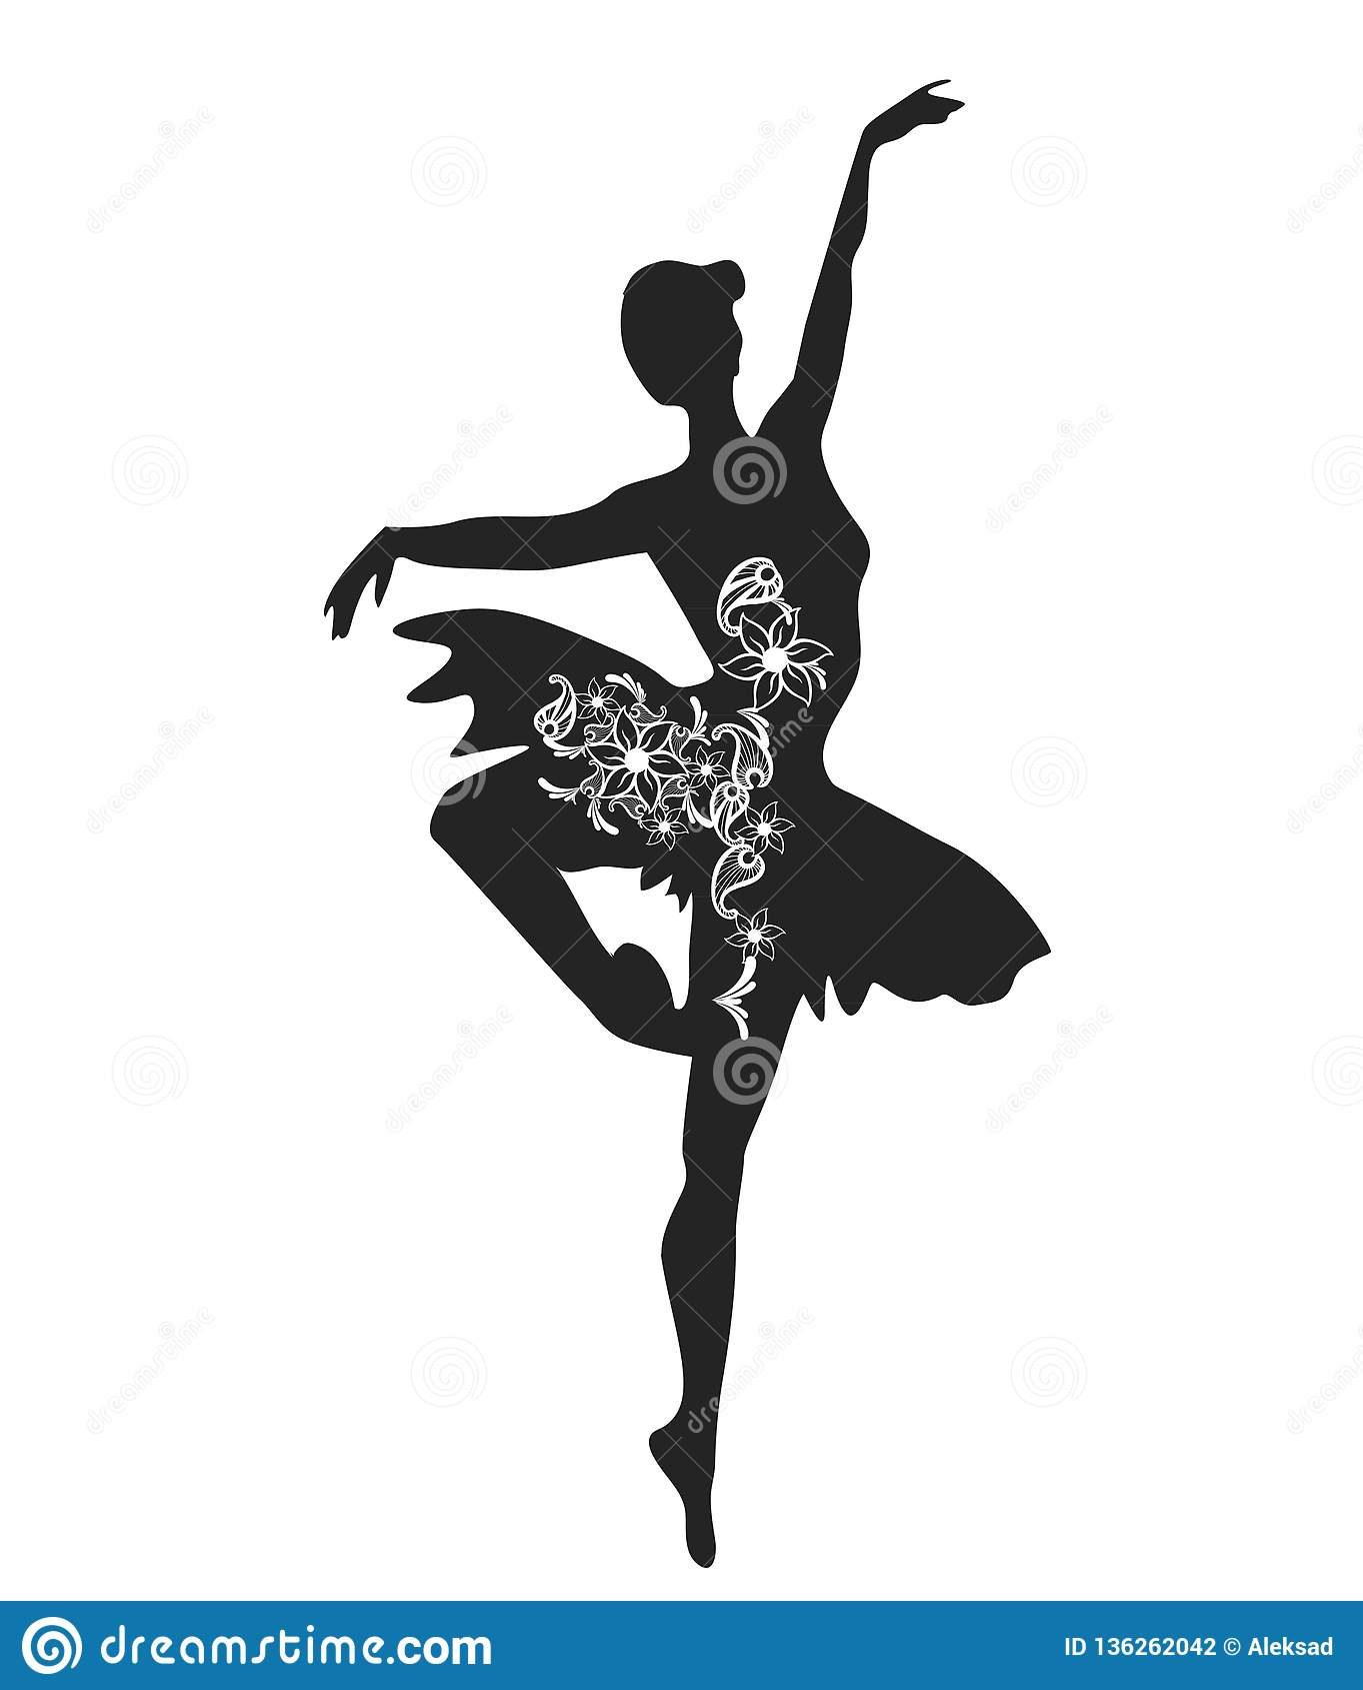 6941db1db1a1f Ballerina Black Silhouette. Ballet Dancing Outline Stock Vector ...